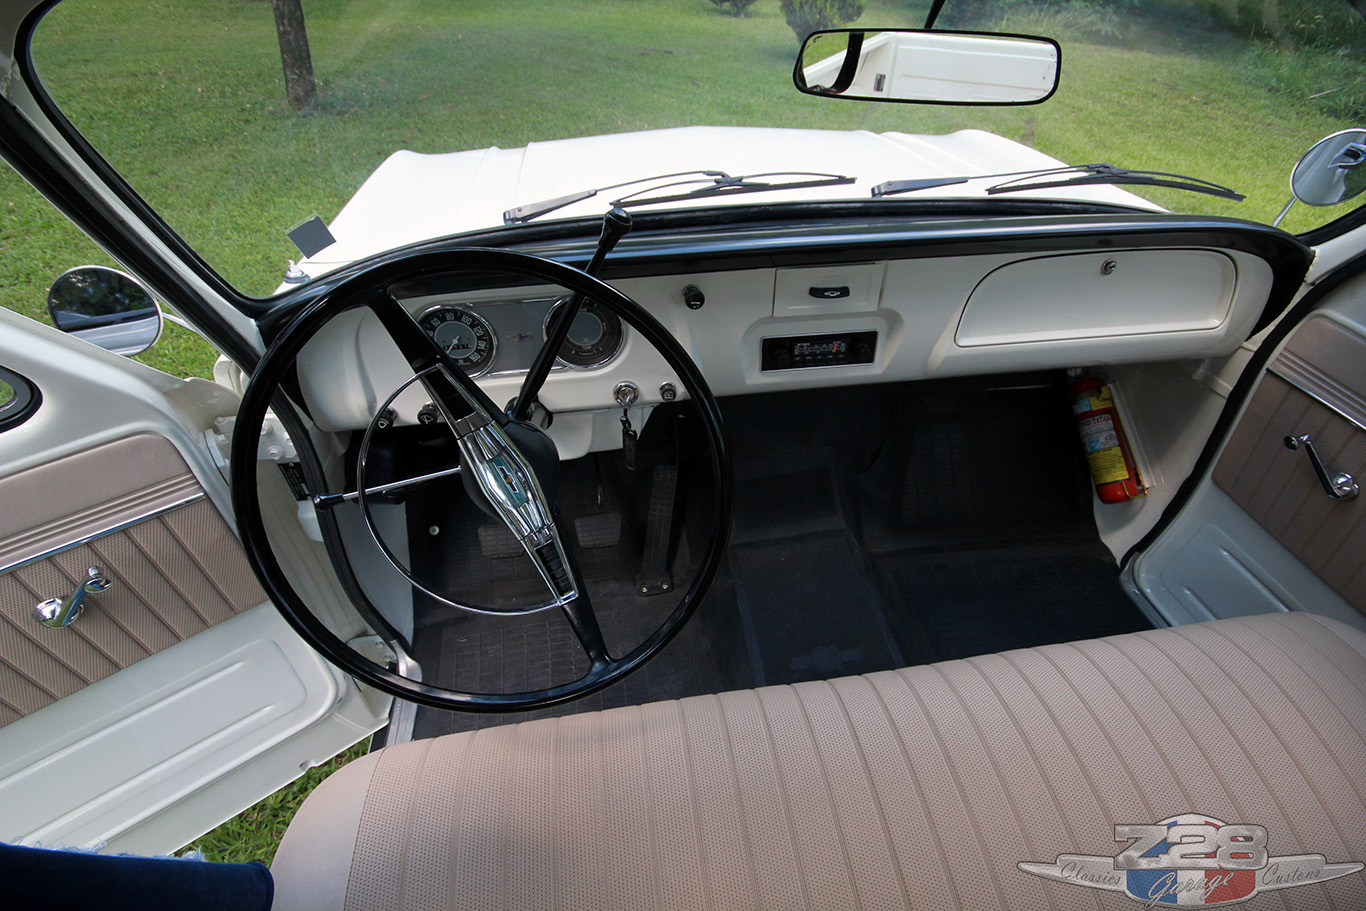 Z28 Garage Chevrolet C10 1973